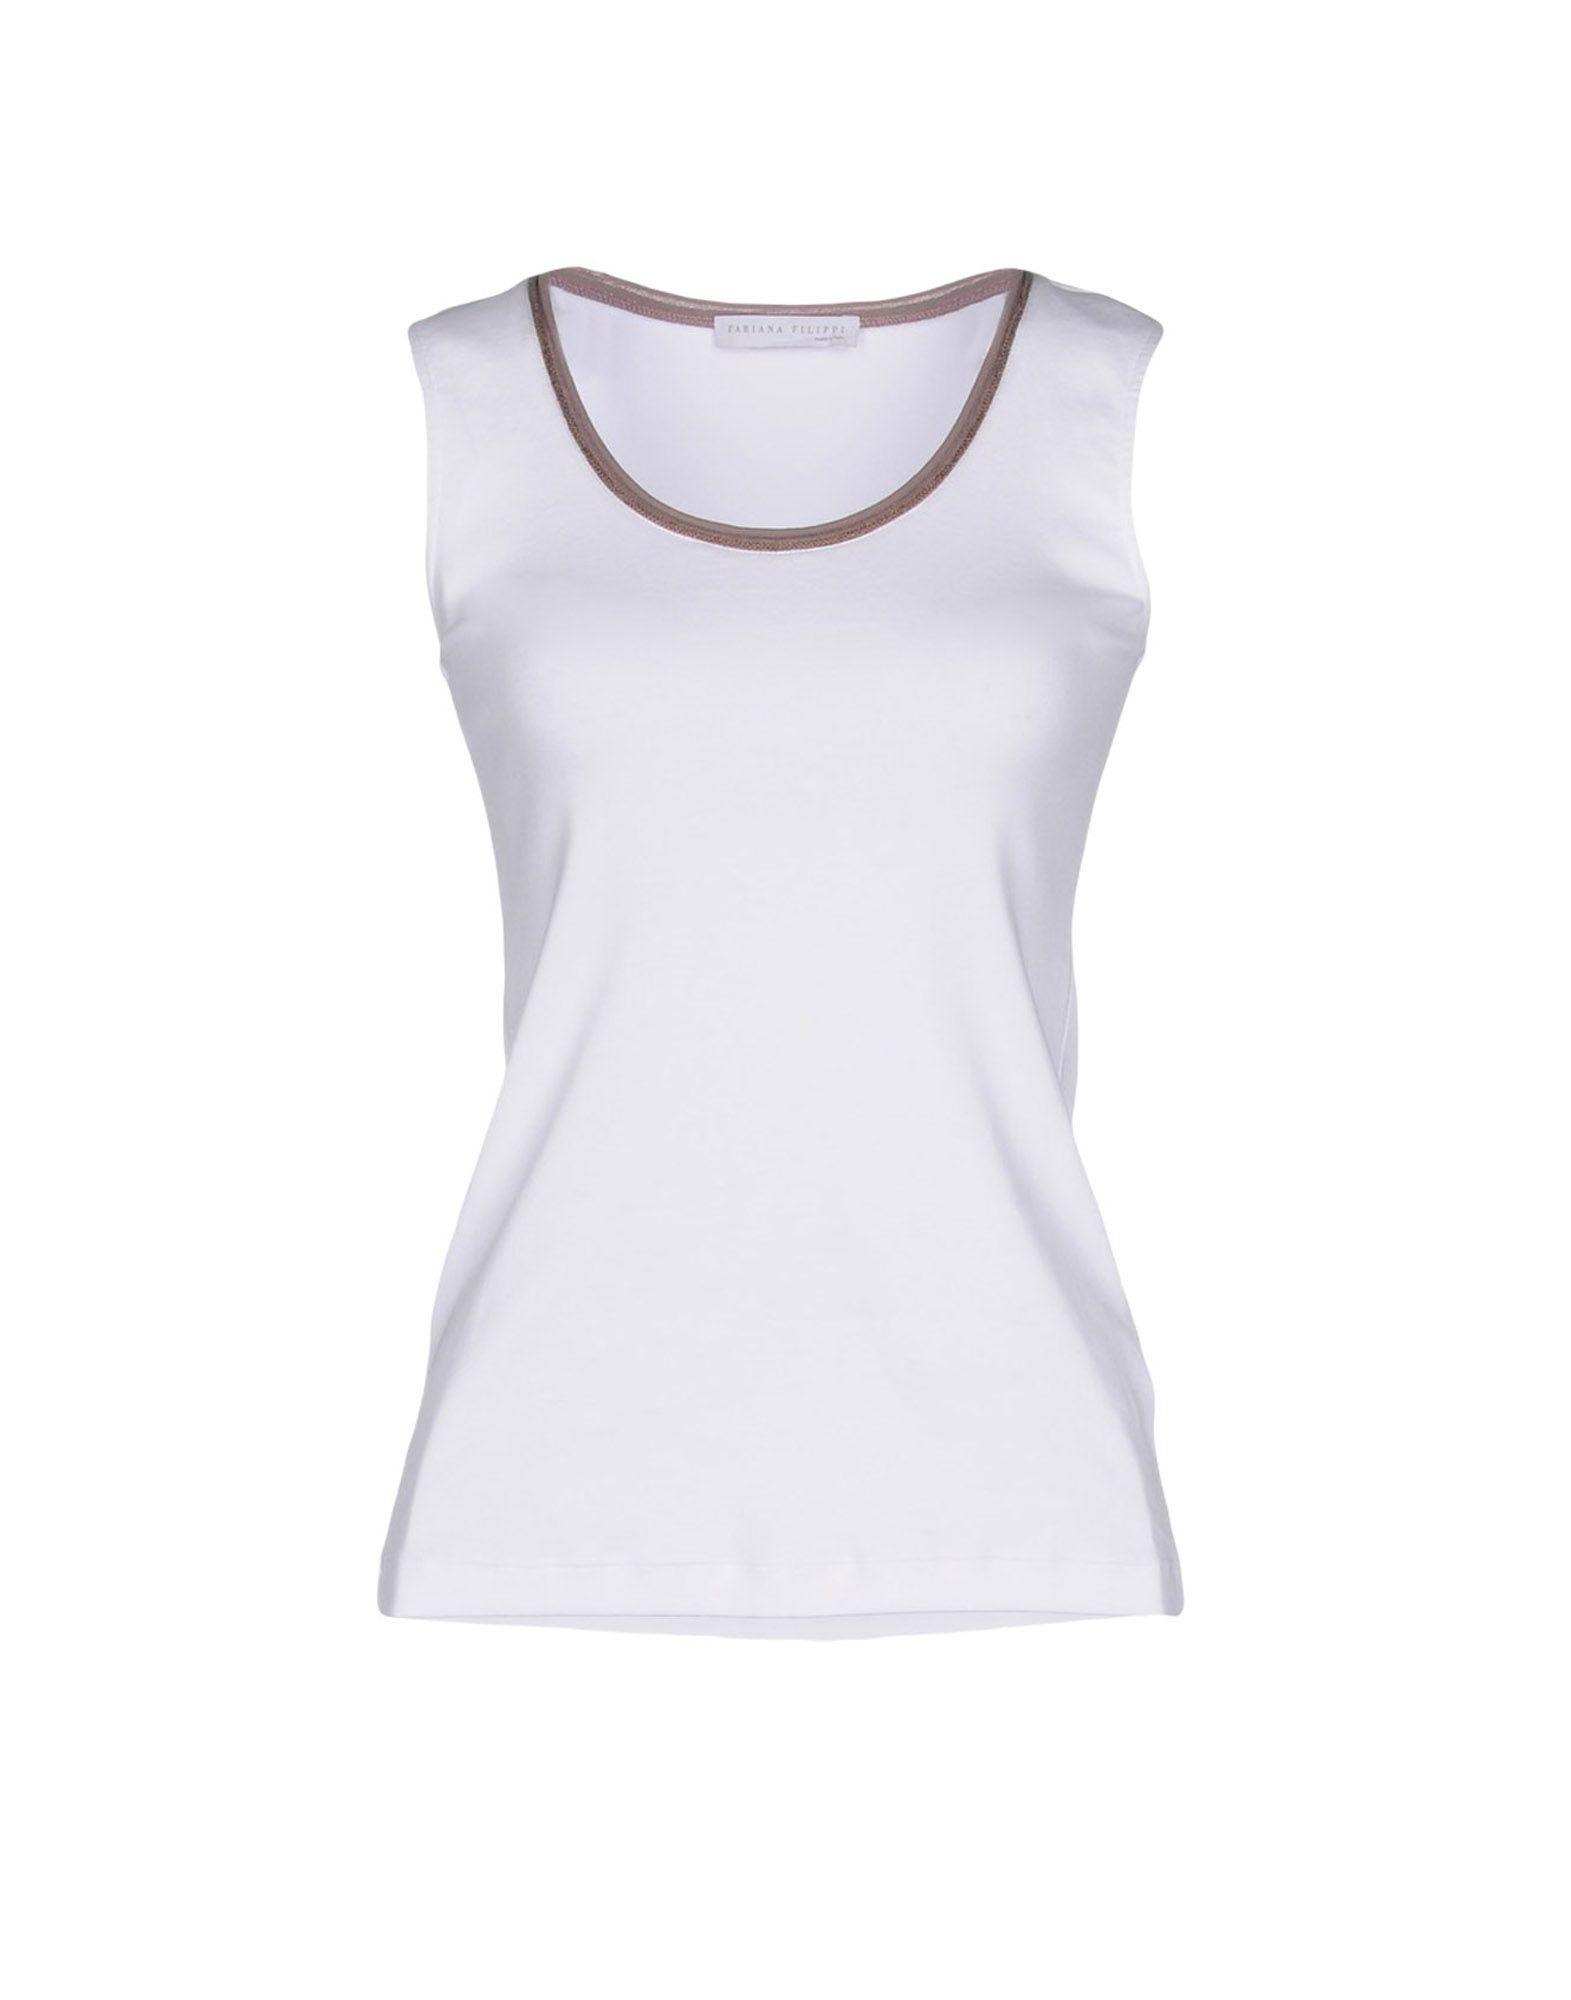 T-Shirt Fabiana Filippi Donna - Acquista online su 3ZP7Yt